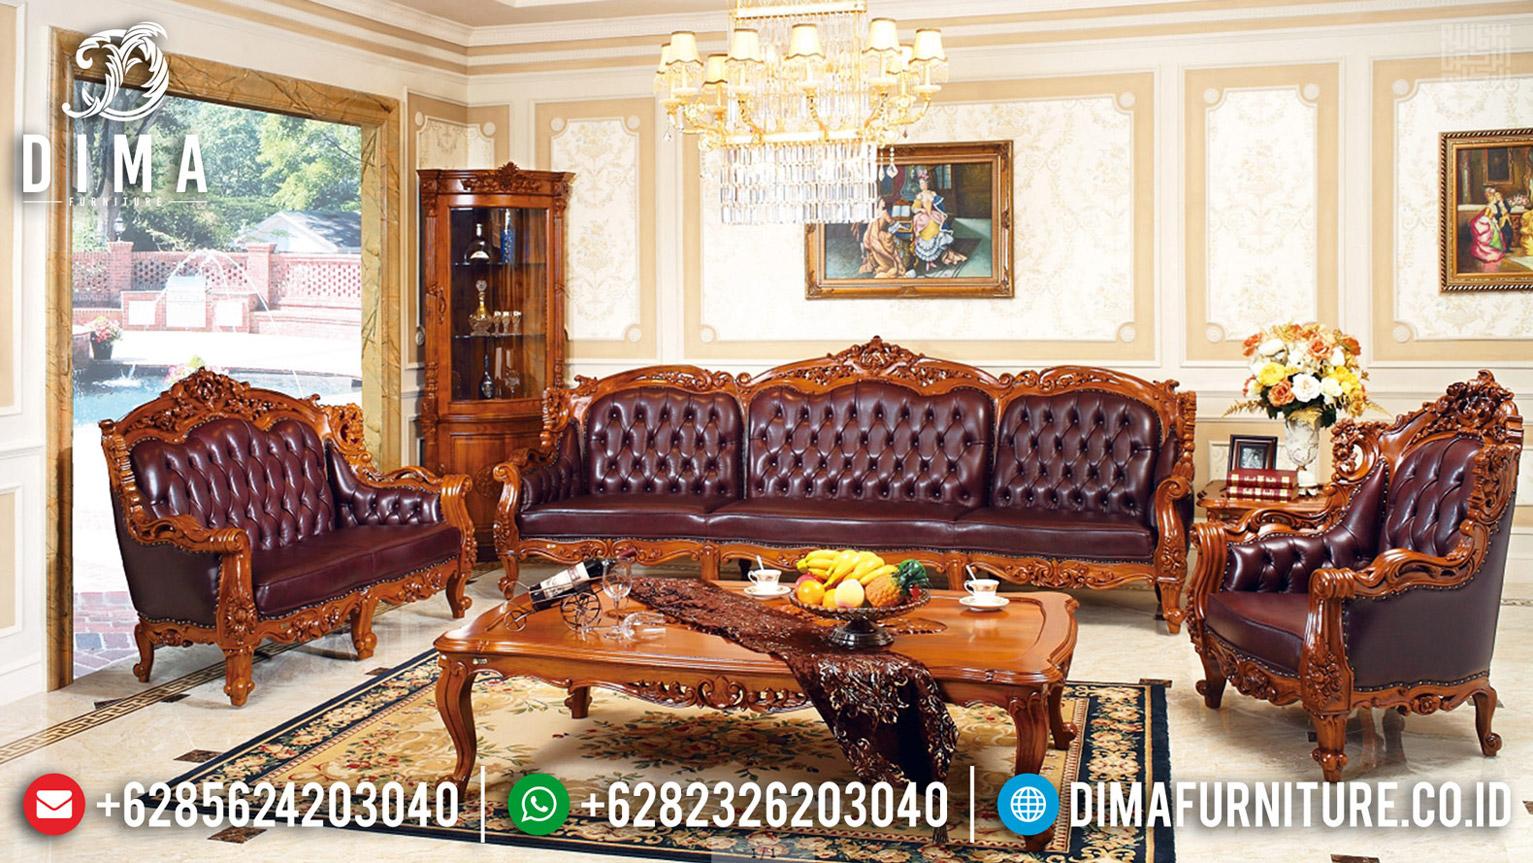 New Sofa Tamu Jati Donatella Natural Classic Auburn Furniture Jepara Antique MMJ-0601